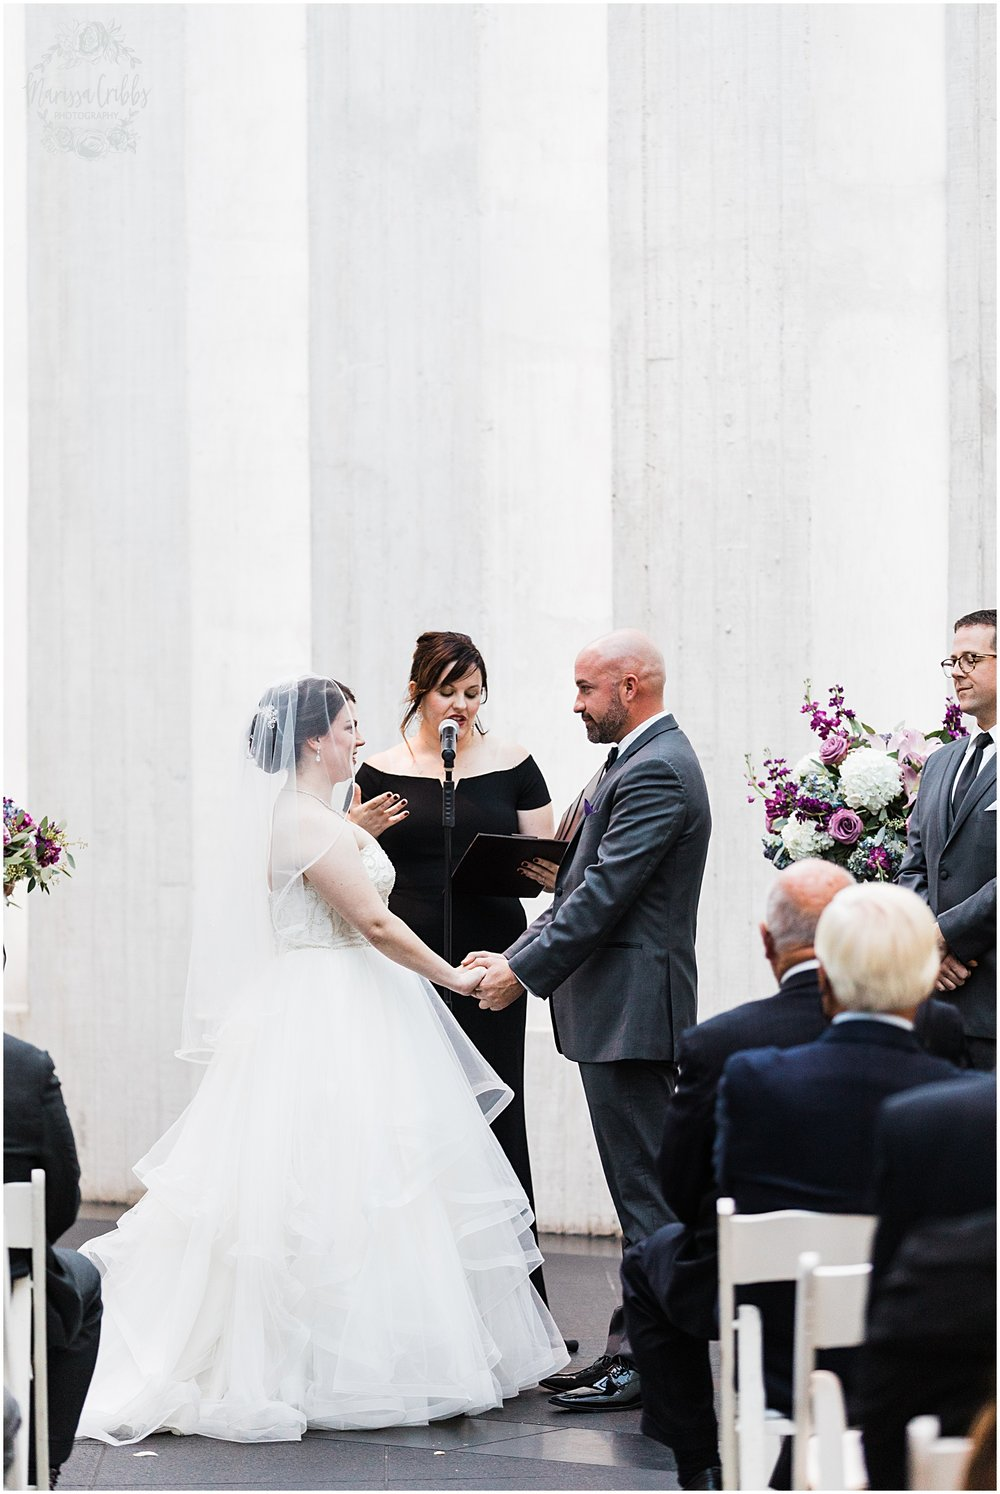 LAURA & DAN MARRIED   NELSON ATKINS MUSEUM   MARISSA CRIBBS PHOTOGRAPHY_7018.jpg